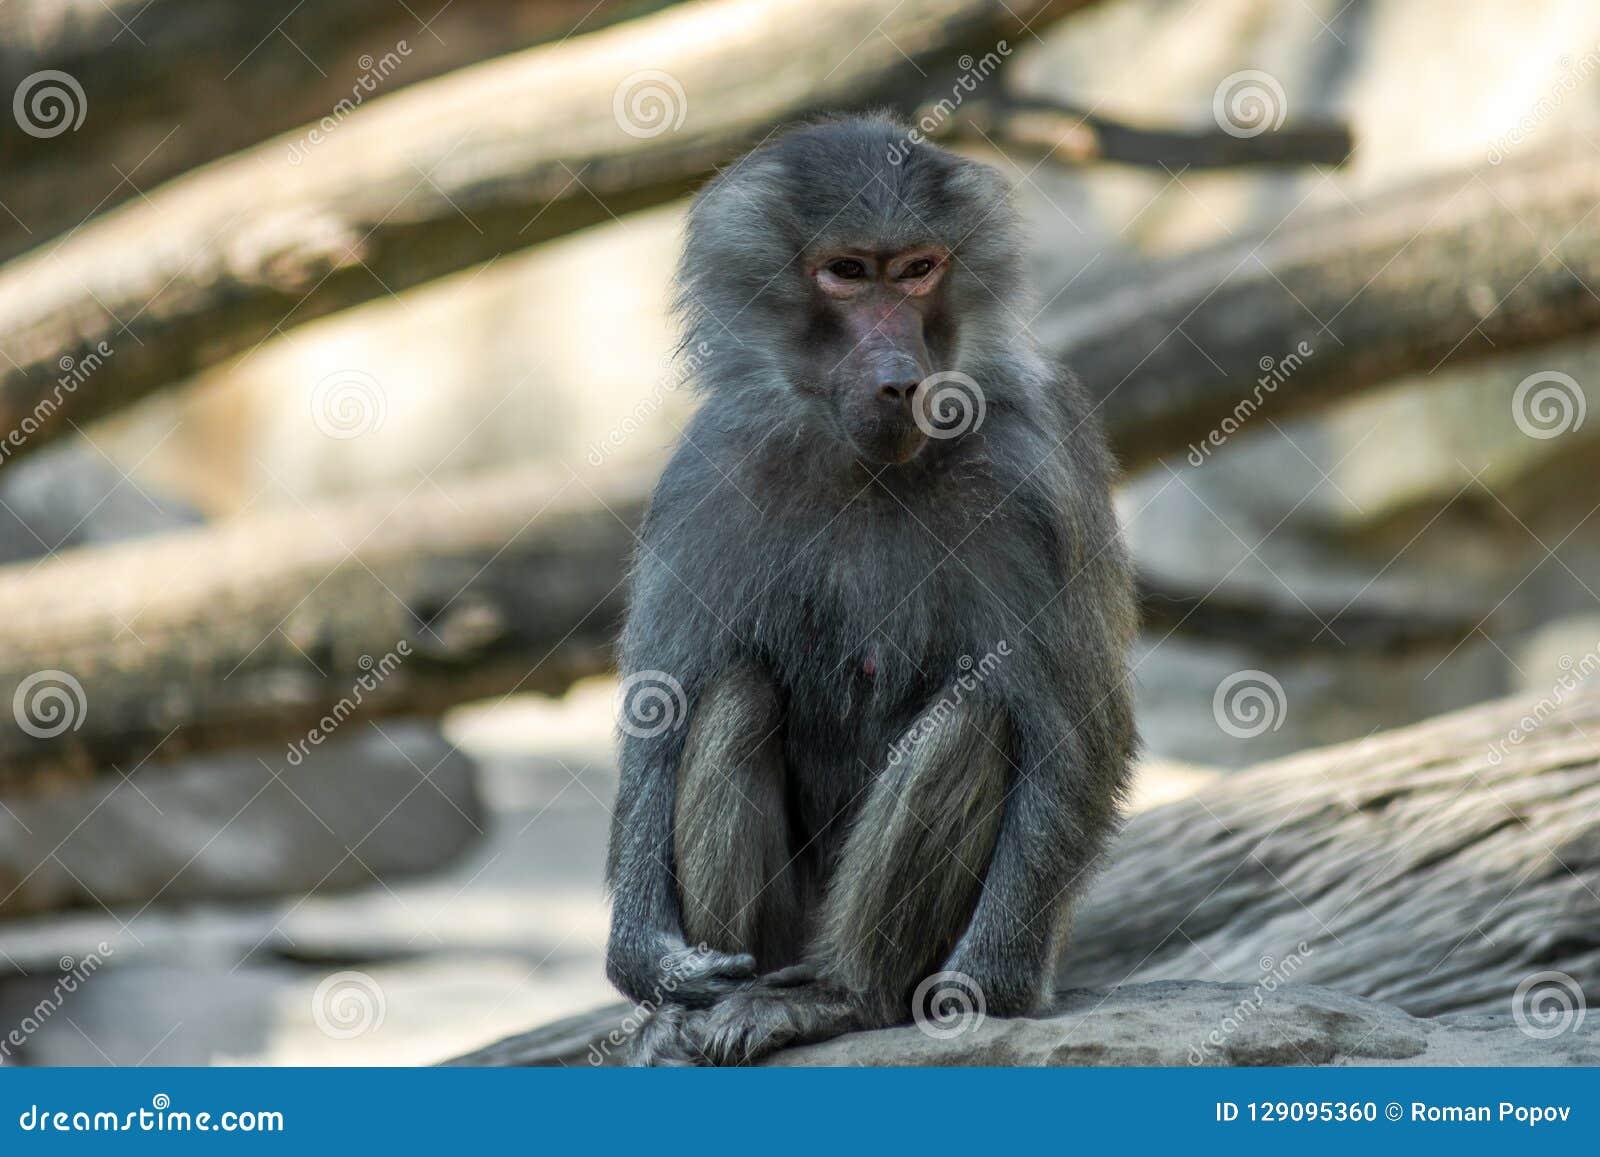 Portrait of monkey sitting alone on the tree